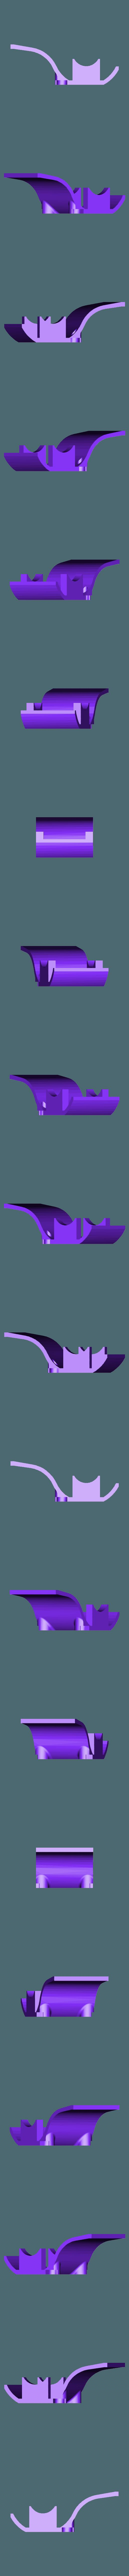 Truck_V4_Centerdiff_CasingB.STL Download STL file 3D Printed Rc Truck V4 • 3D printable template, MrCrankyface